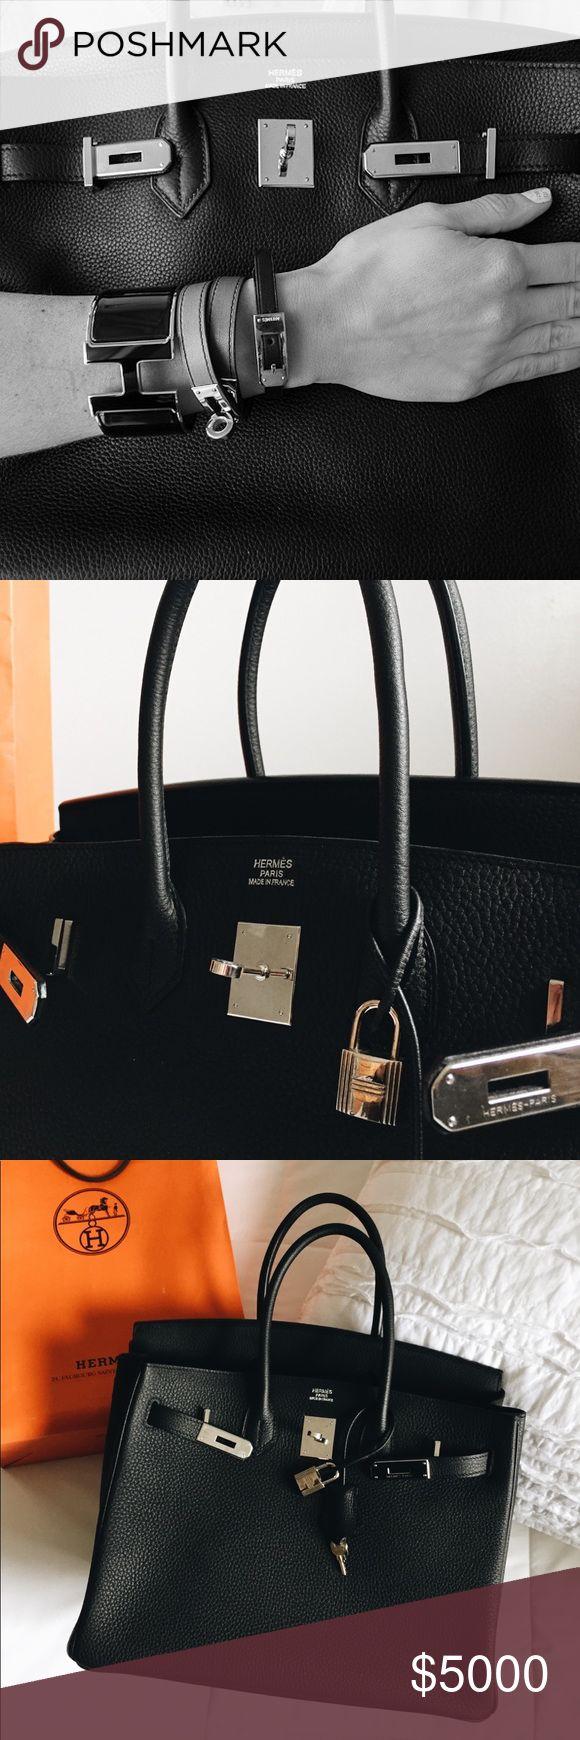 Hermes Birkin 35cm Clemence Leather Hermes Birkin 35cm Clemence Leather Palladium hardware  **Pre-loved Hermes Bags